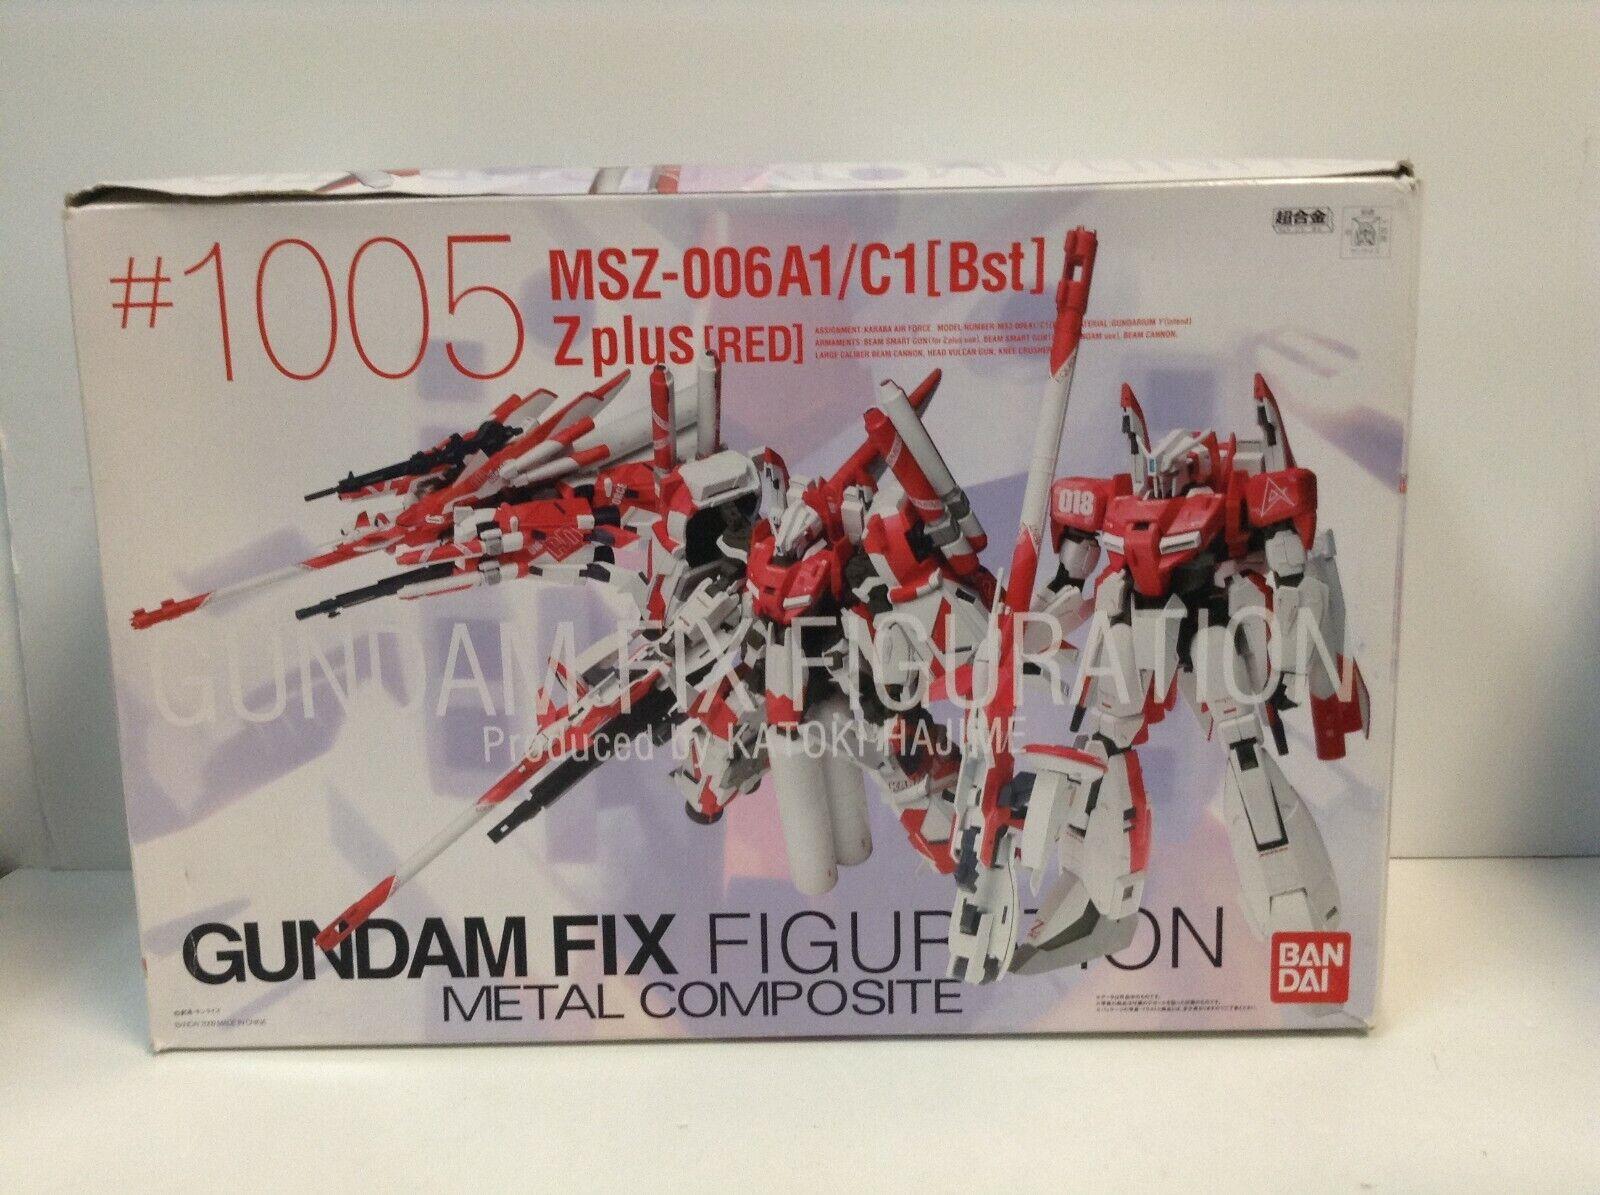 Mobile Suit Gundam-MSZ-006A1 C1 BST Zplus Rojo Fix figuración Bandai Menta en caja